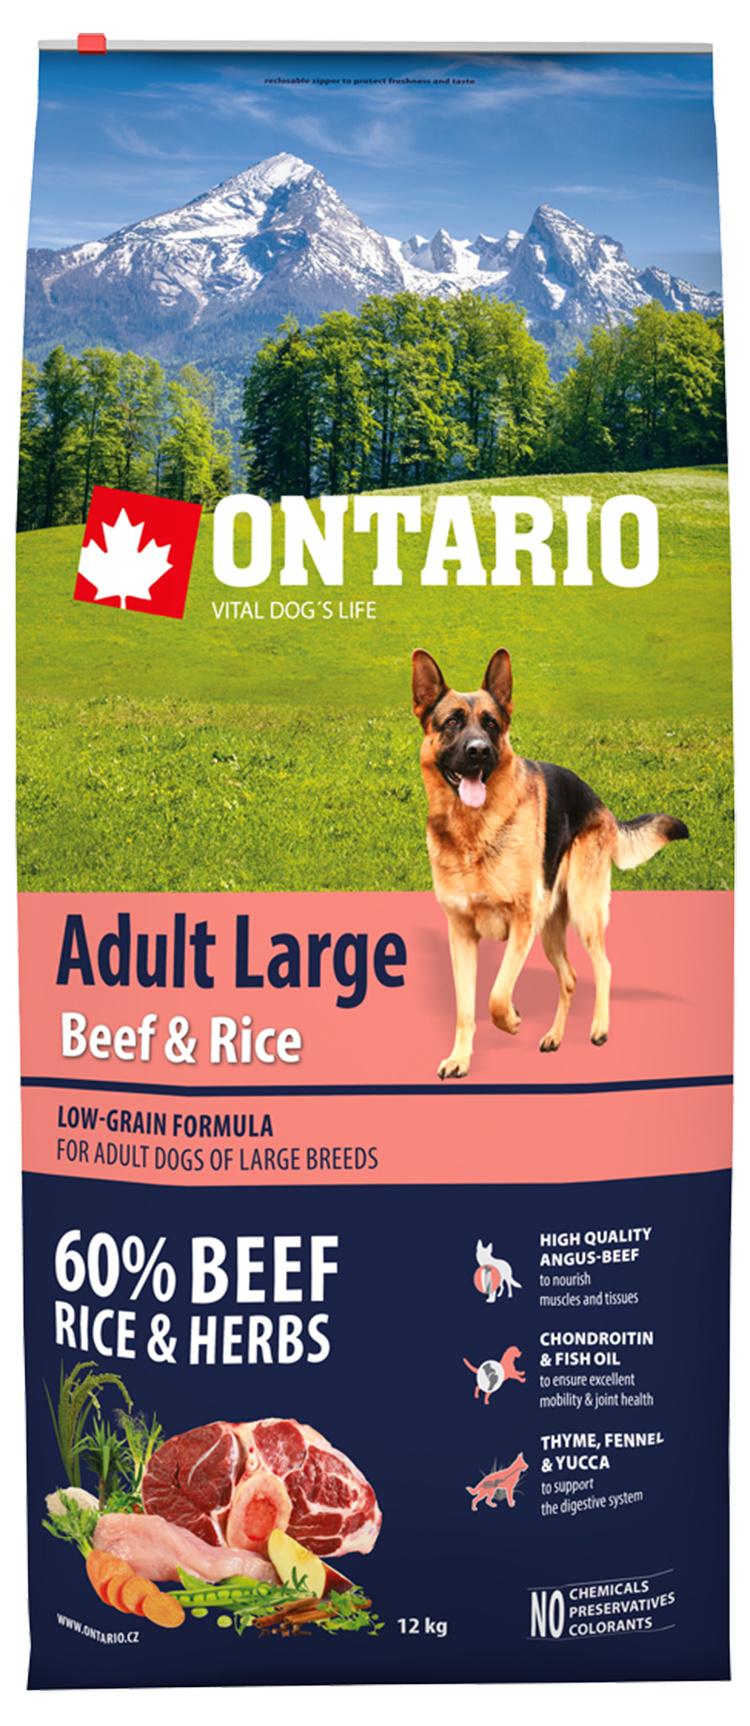 Barība suņiem - ONTARIO Adult Large Beef & Rice, 12 kg